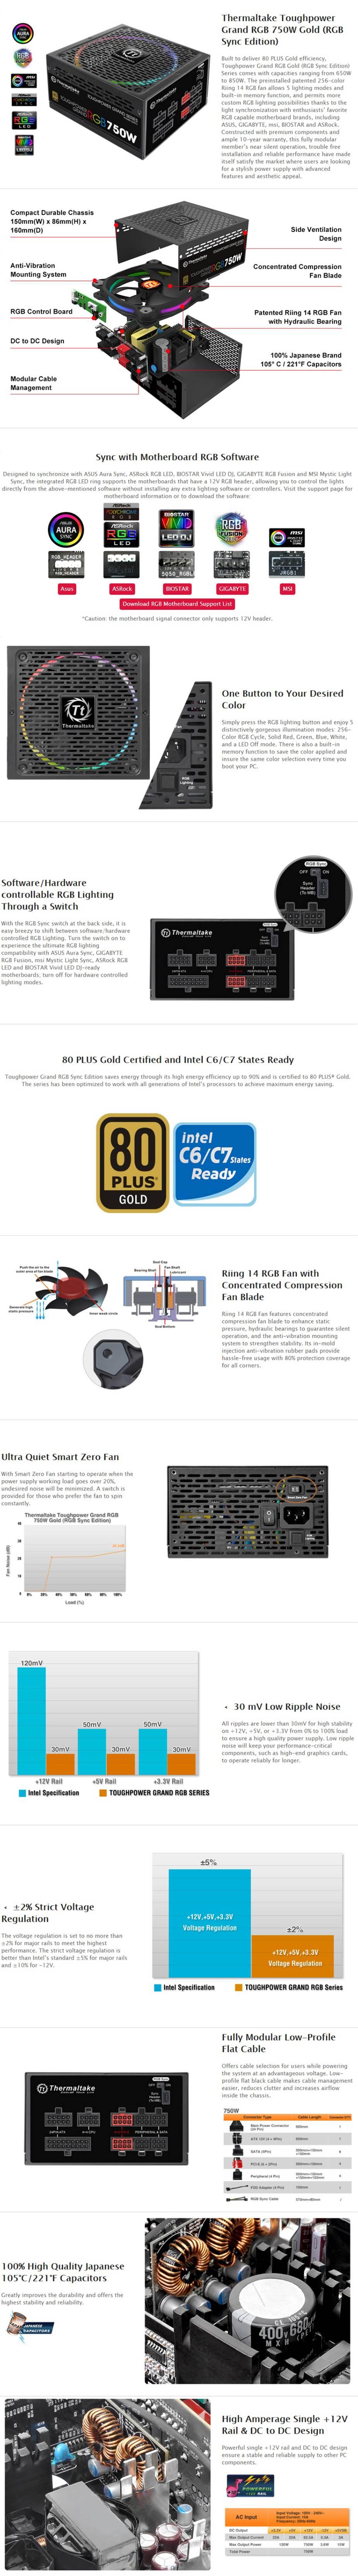 Thermaltake Toughpower Grand Sync RGB 80+ Gold 750W Fully Modular